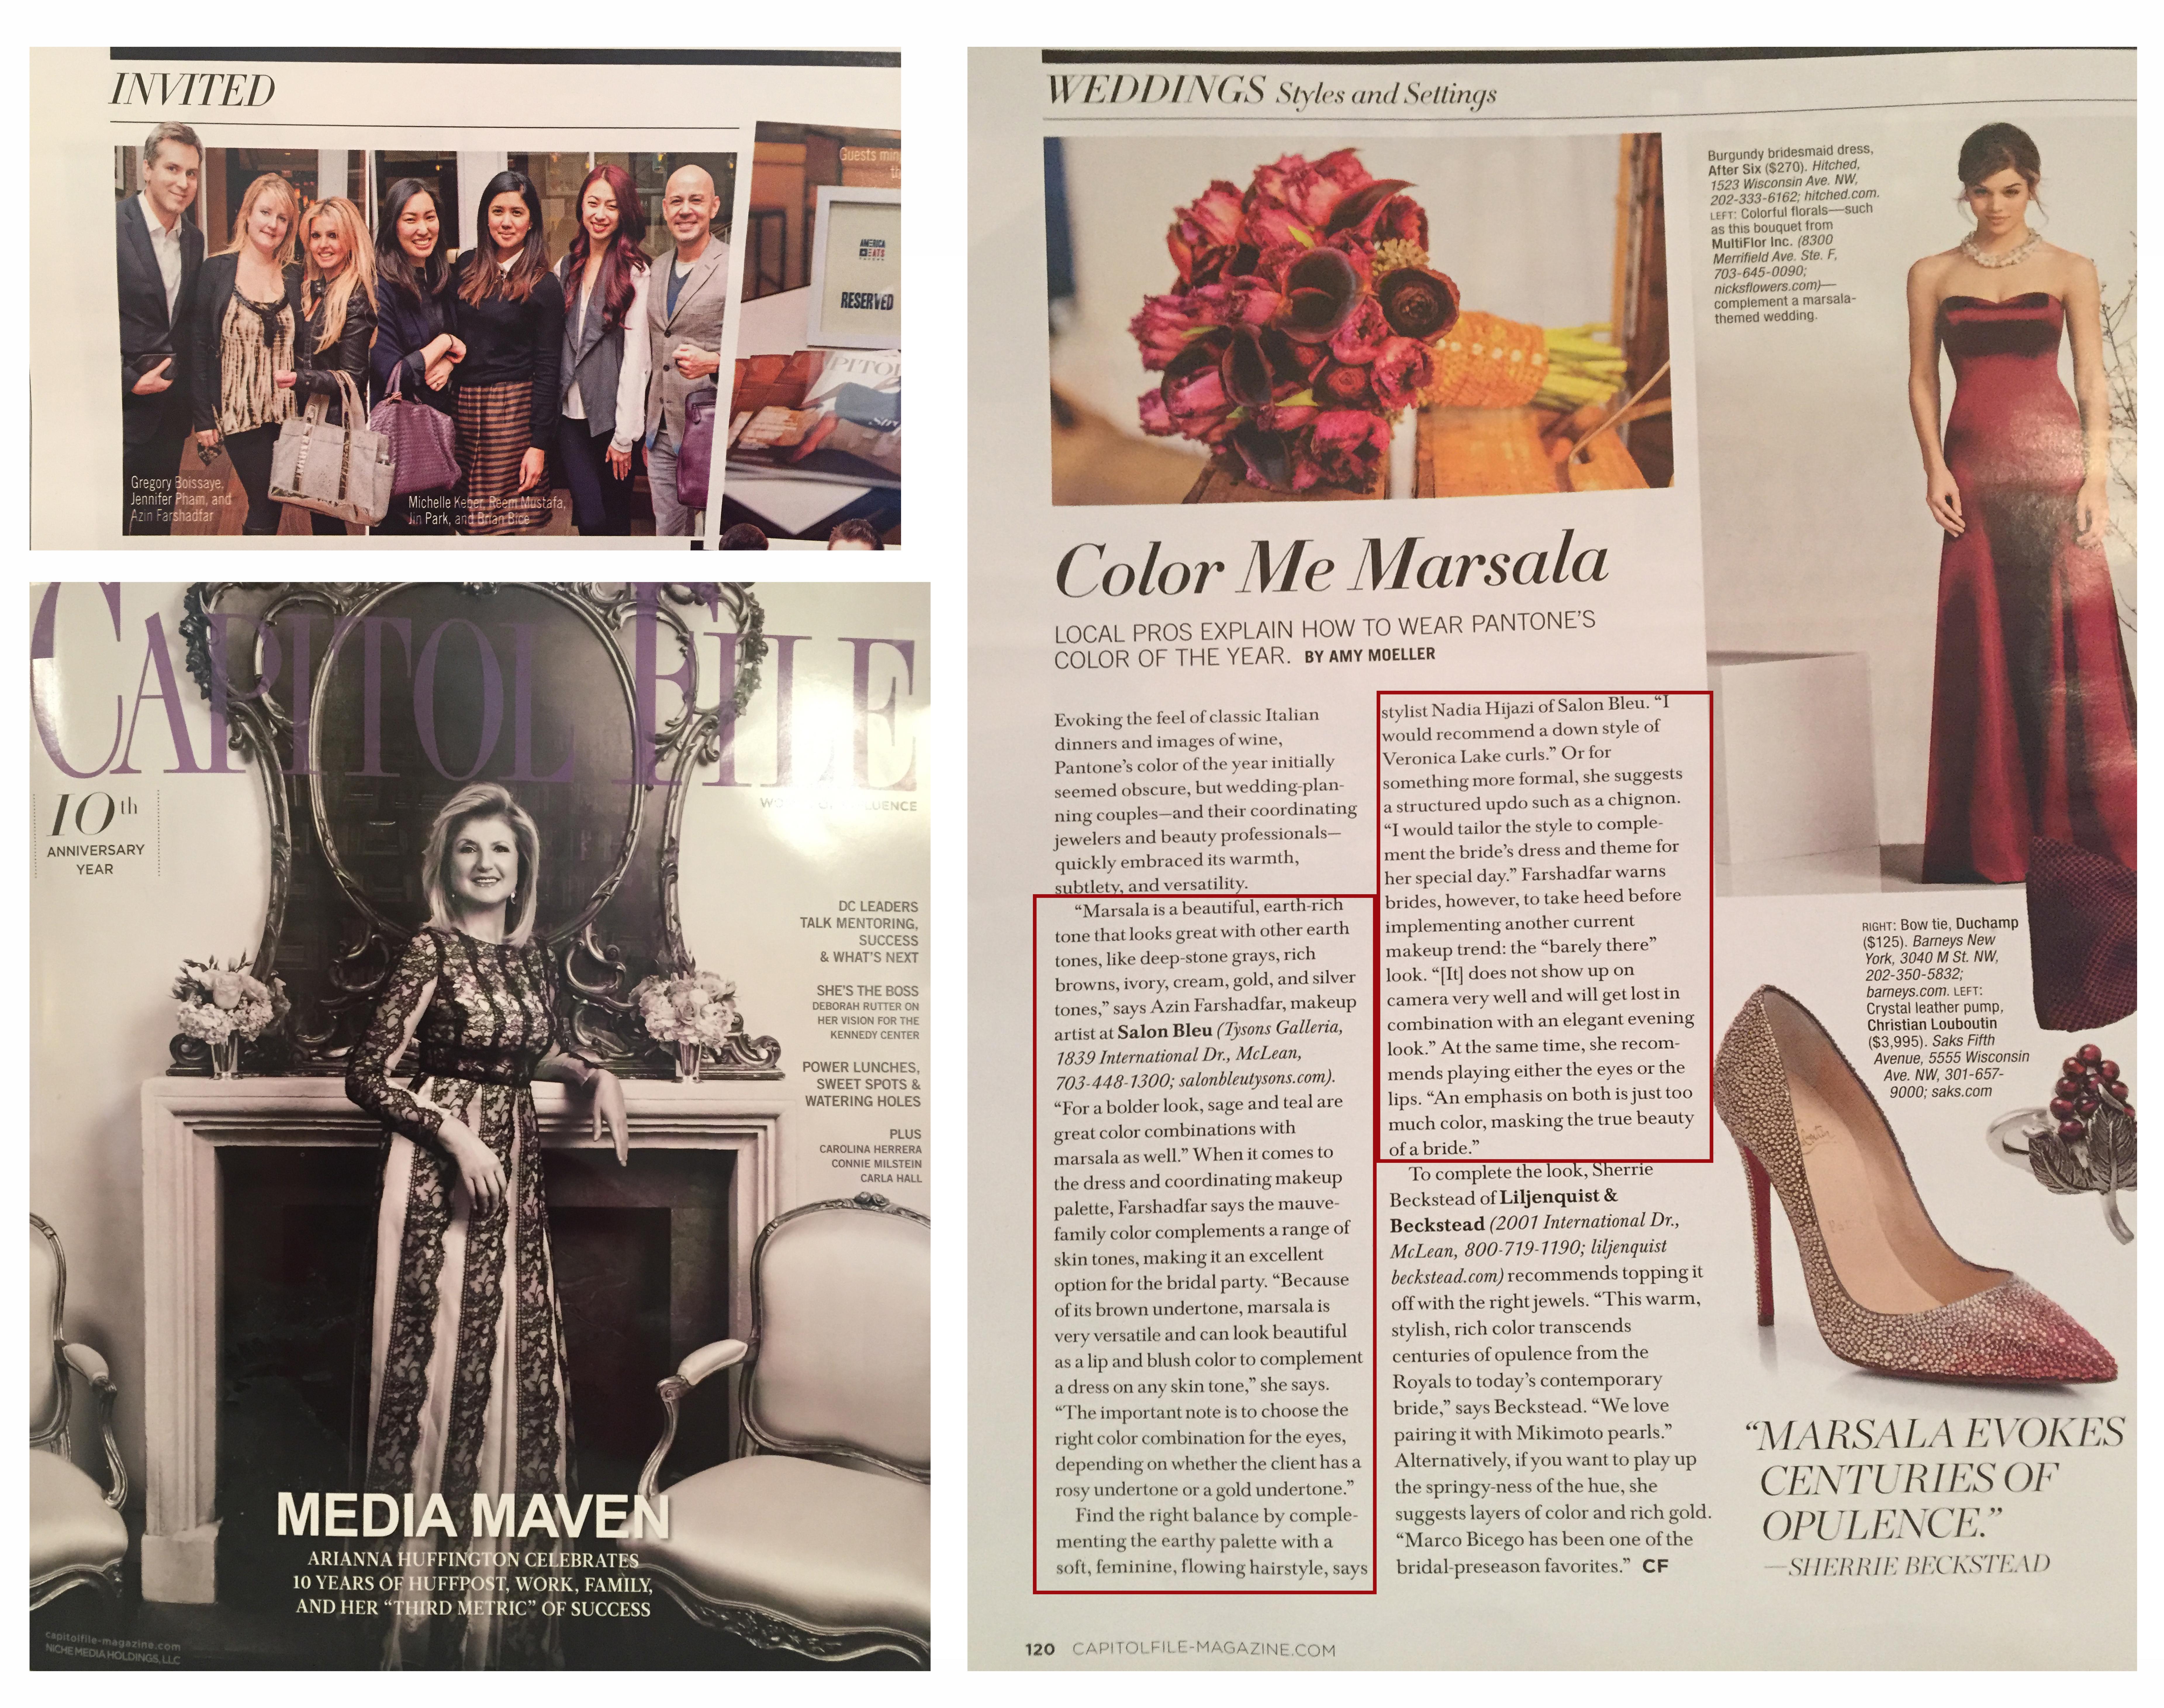 Muse Studios Hair and Makeup Artistry Wedding Bridal Capitol File Magazine - April 2015